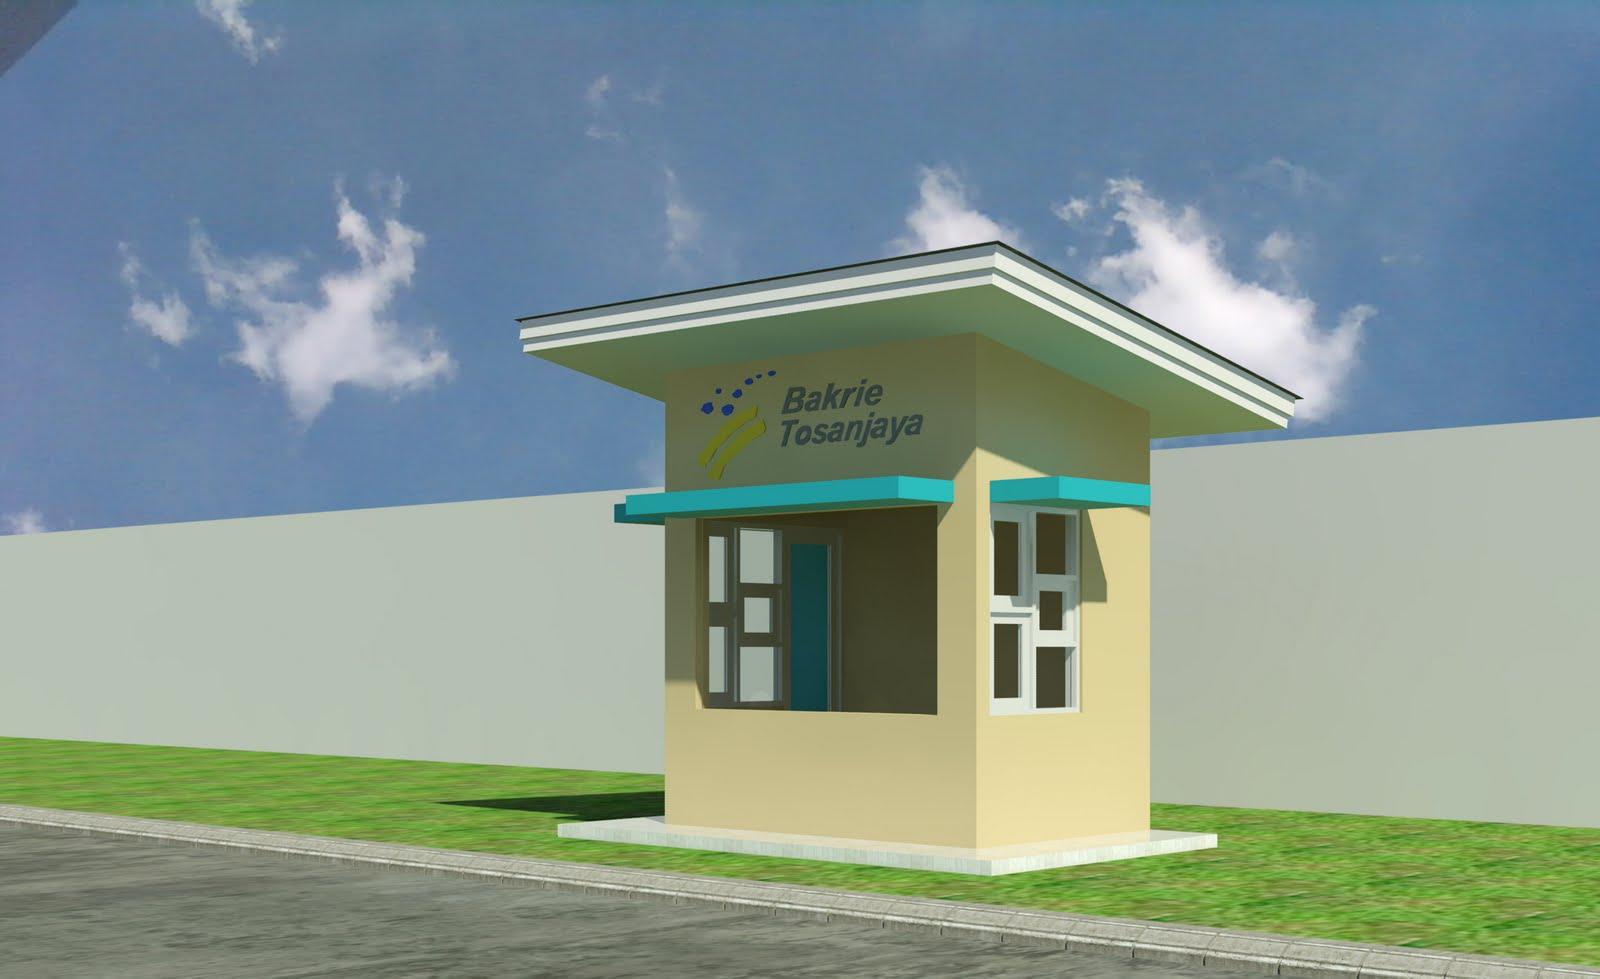 Desain Pos Jaga Bakrie Tosanjaya Raya Bekasi Pondok